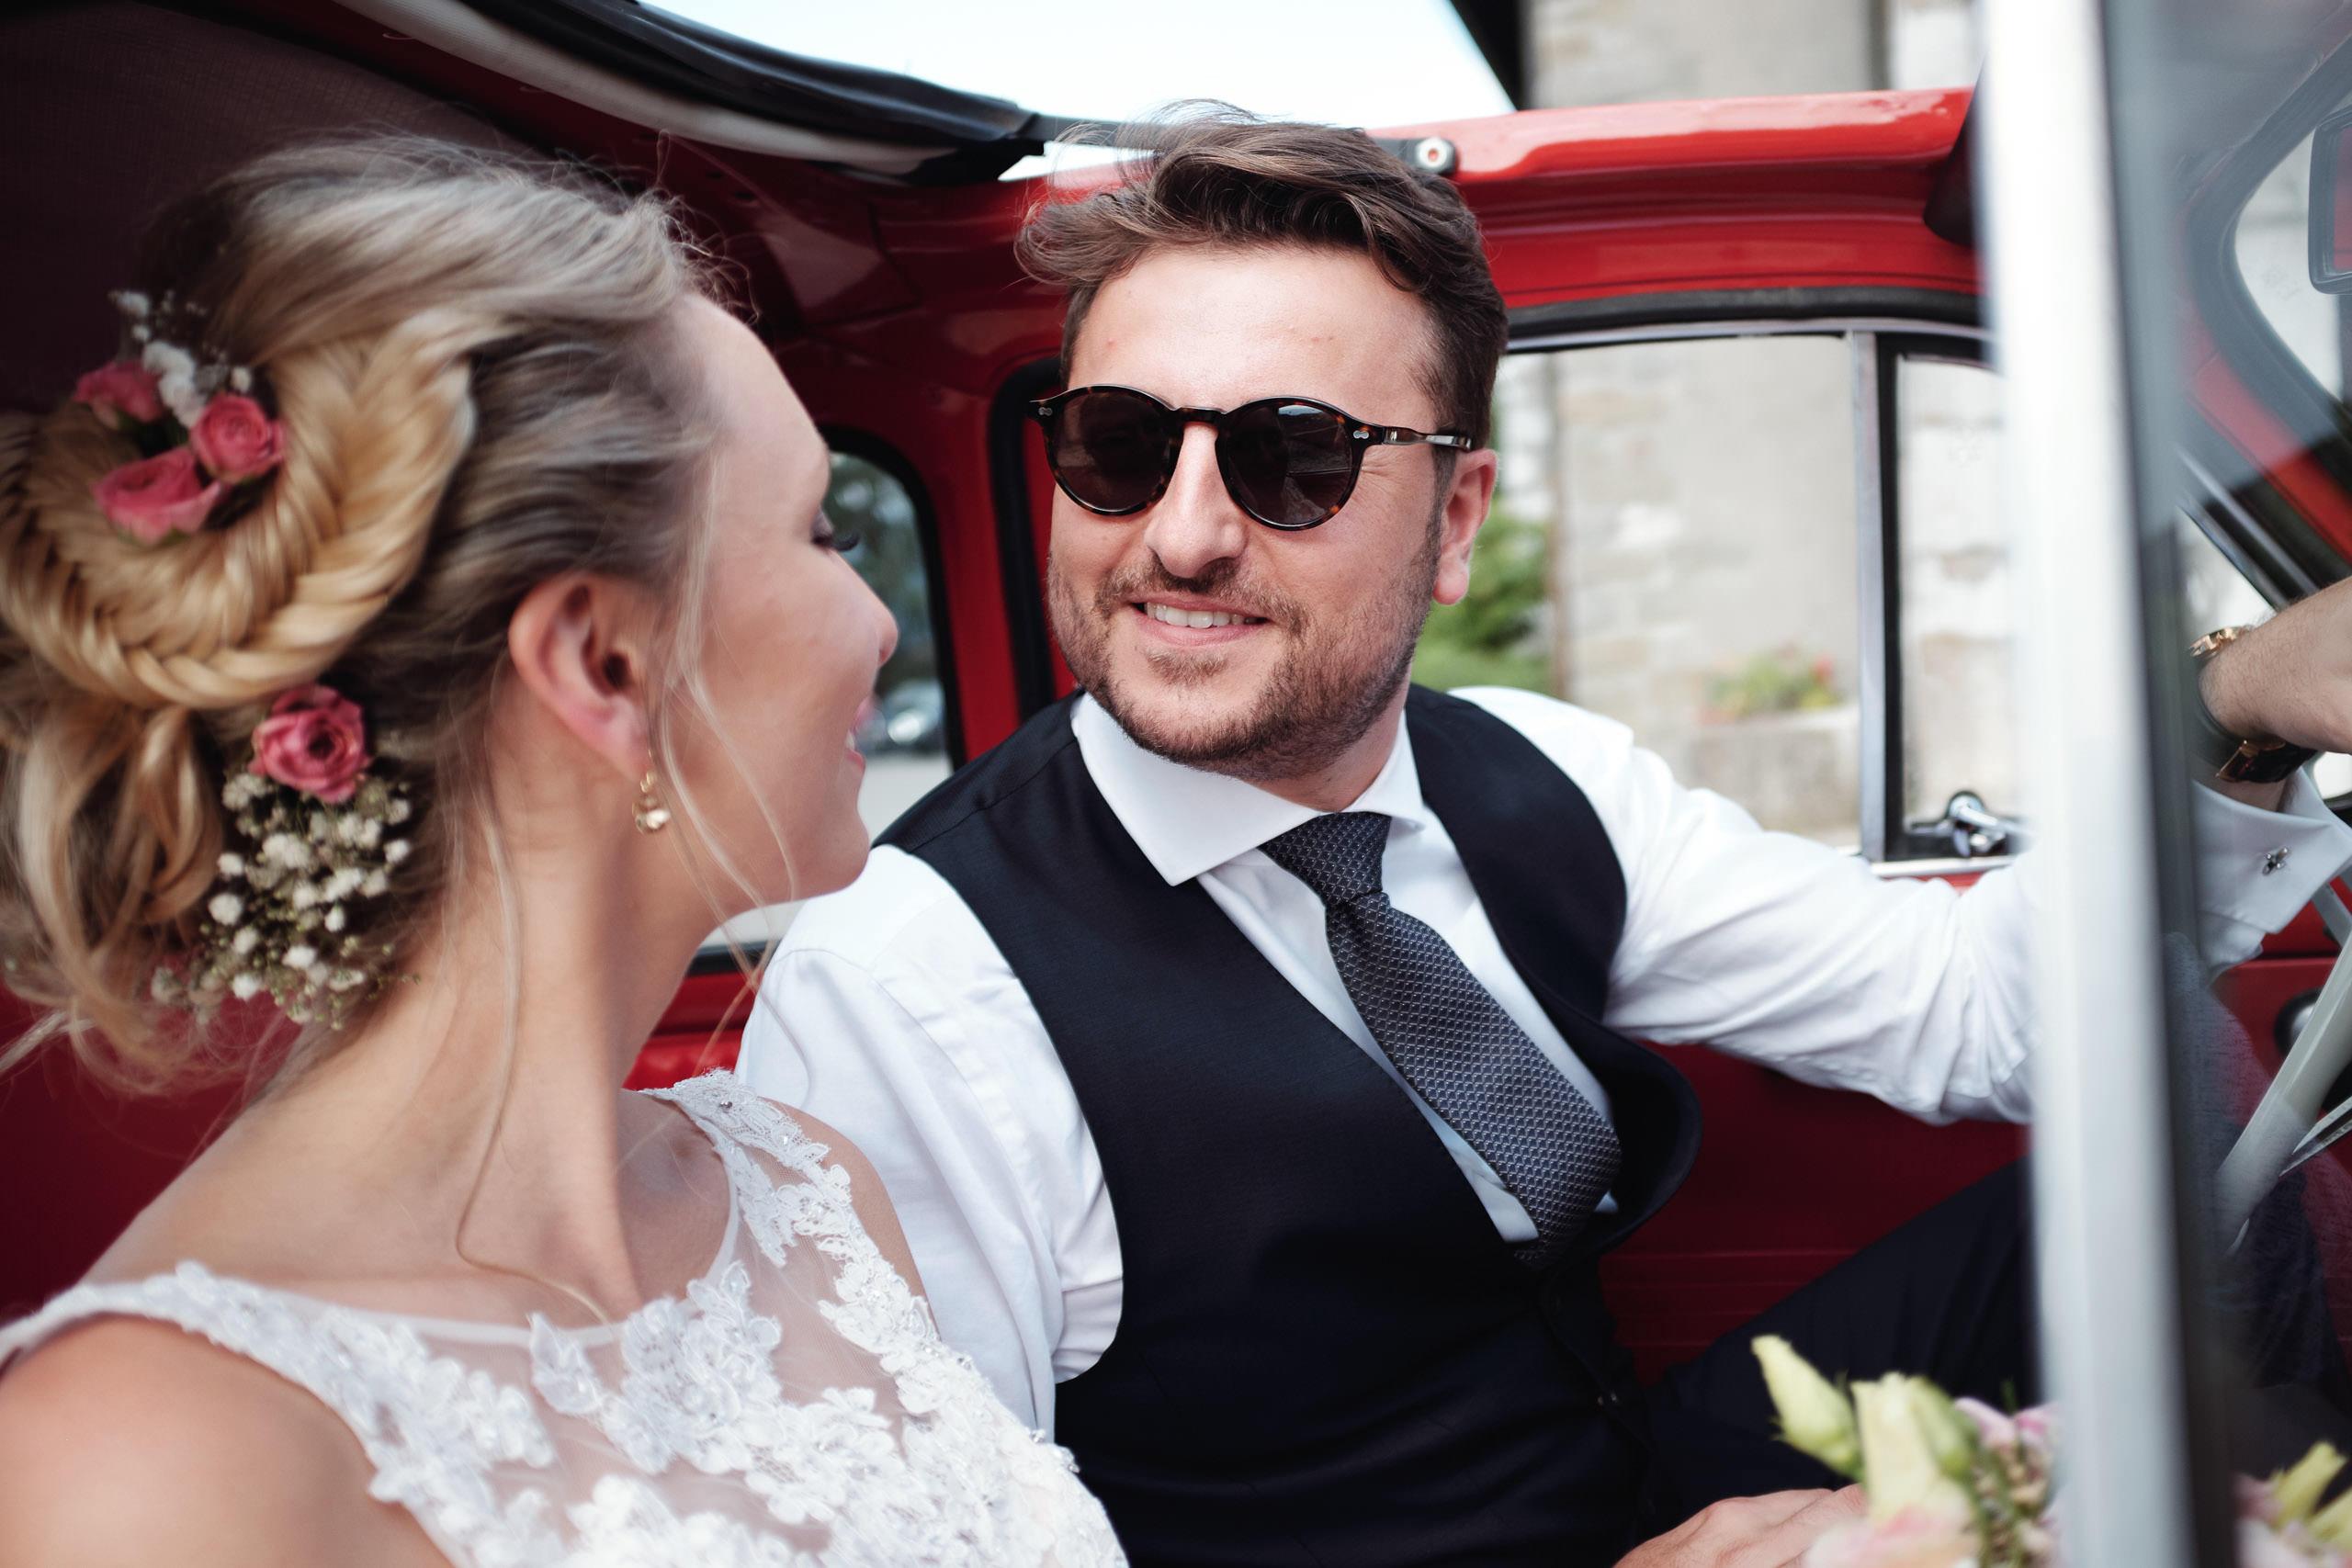 Fiat 500 rouge - Photographe mariage à Annecy